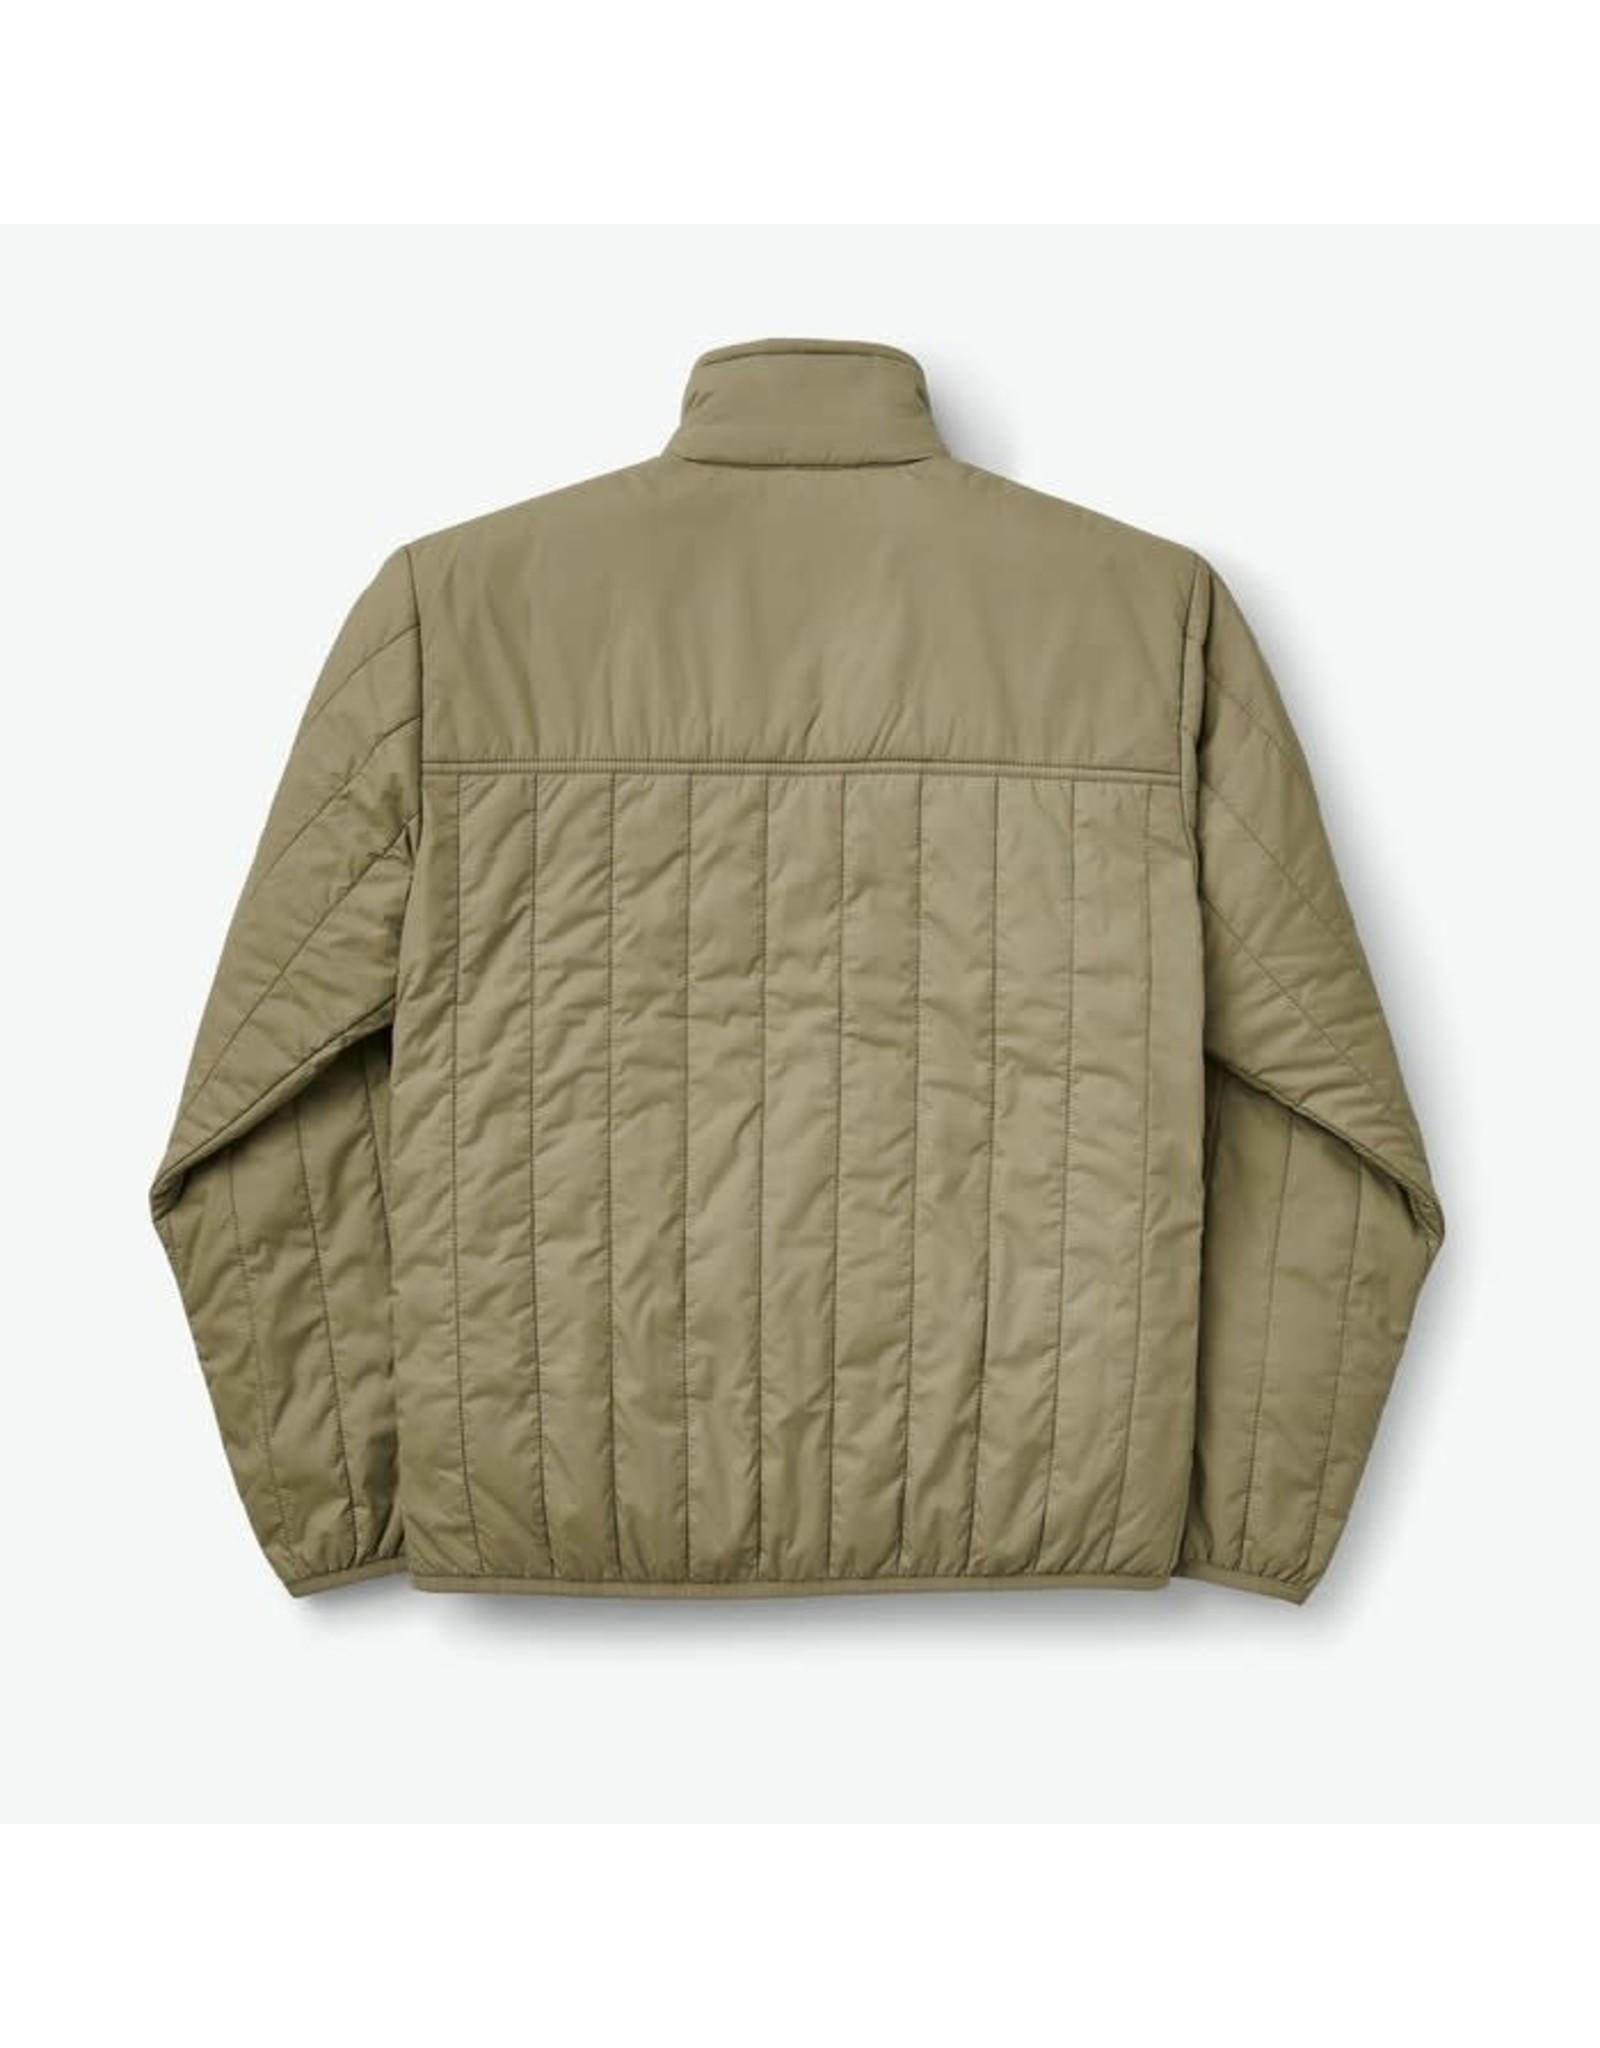 Filson Ultralight Jacket